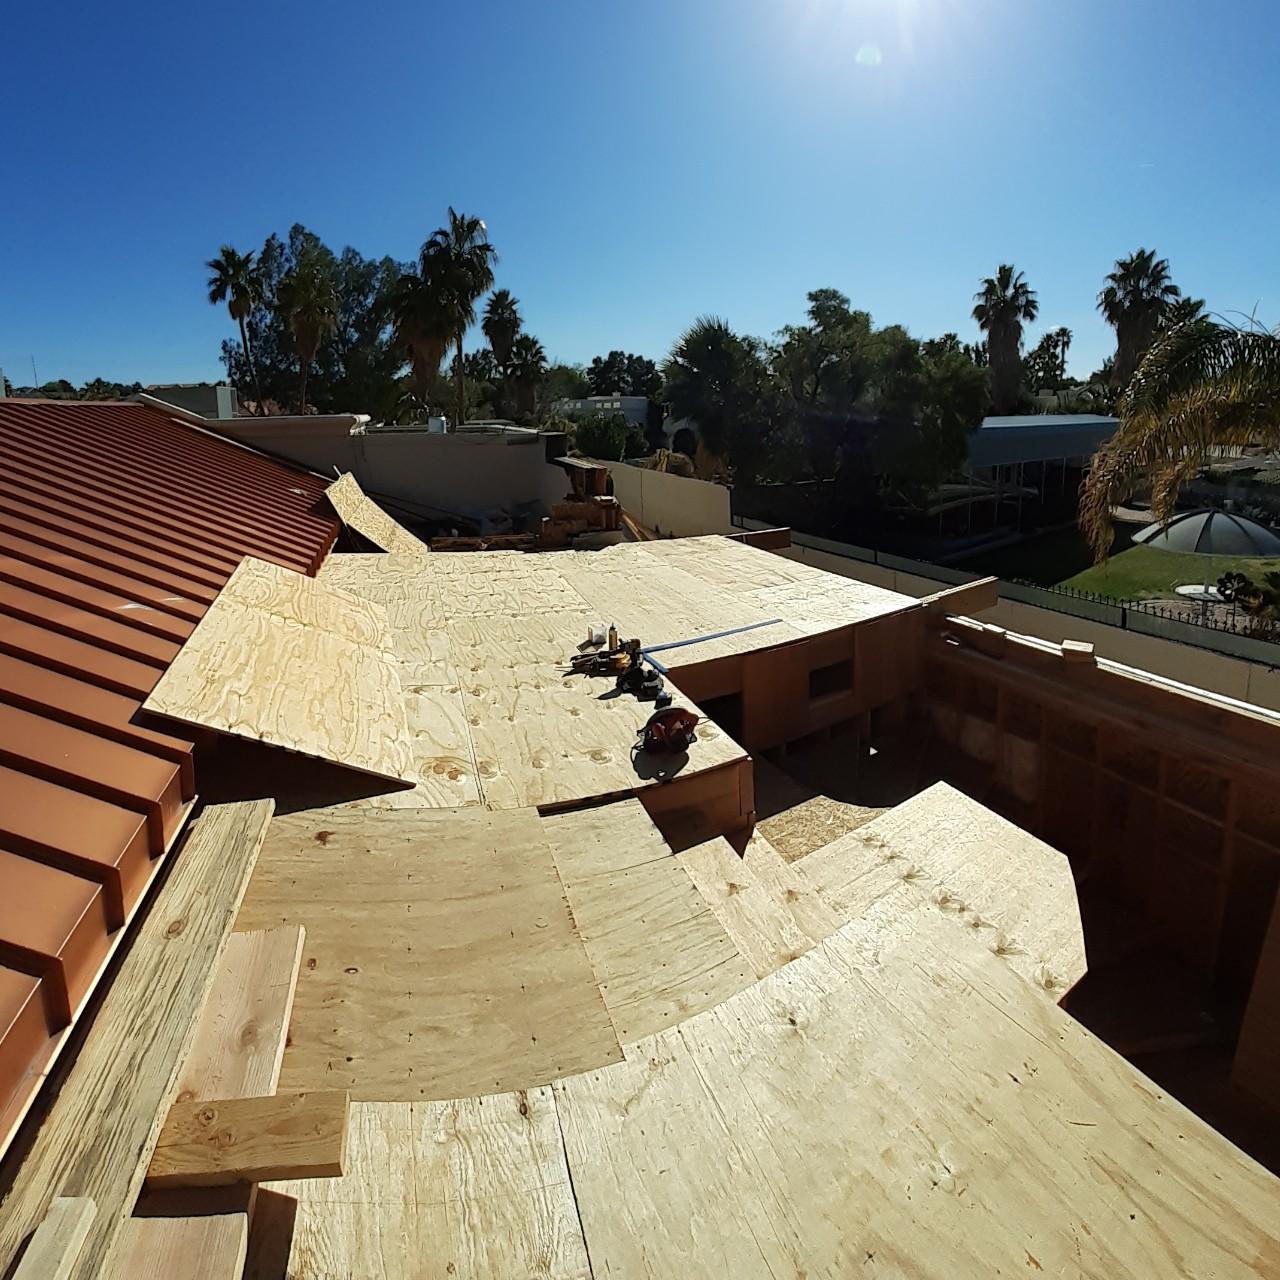 carpentry-wood-framing-second-floor-home-addition--framing-65